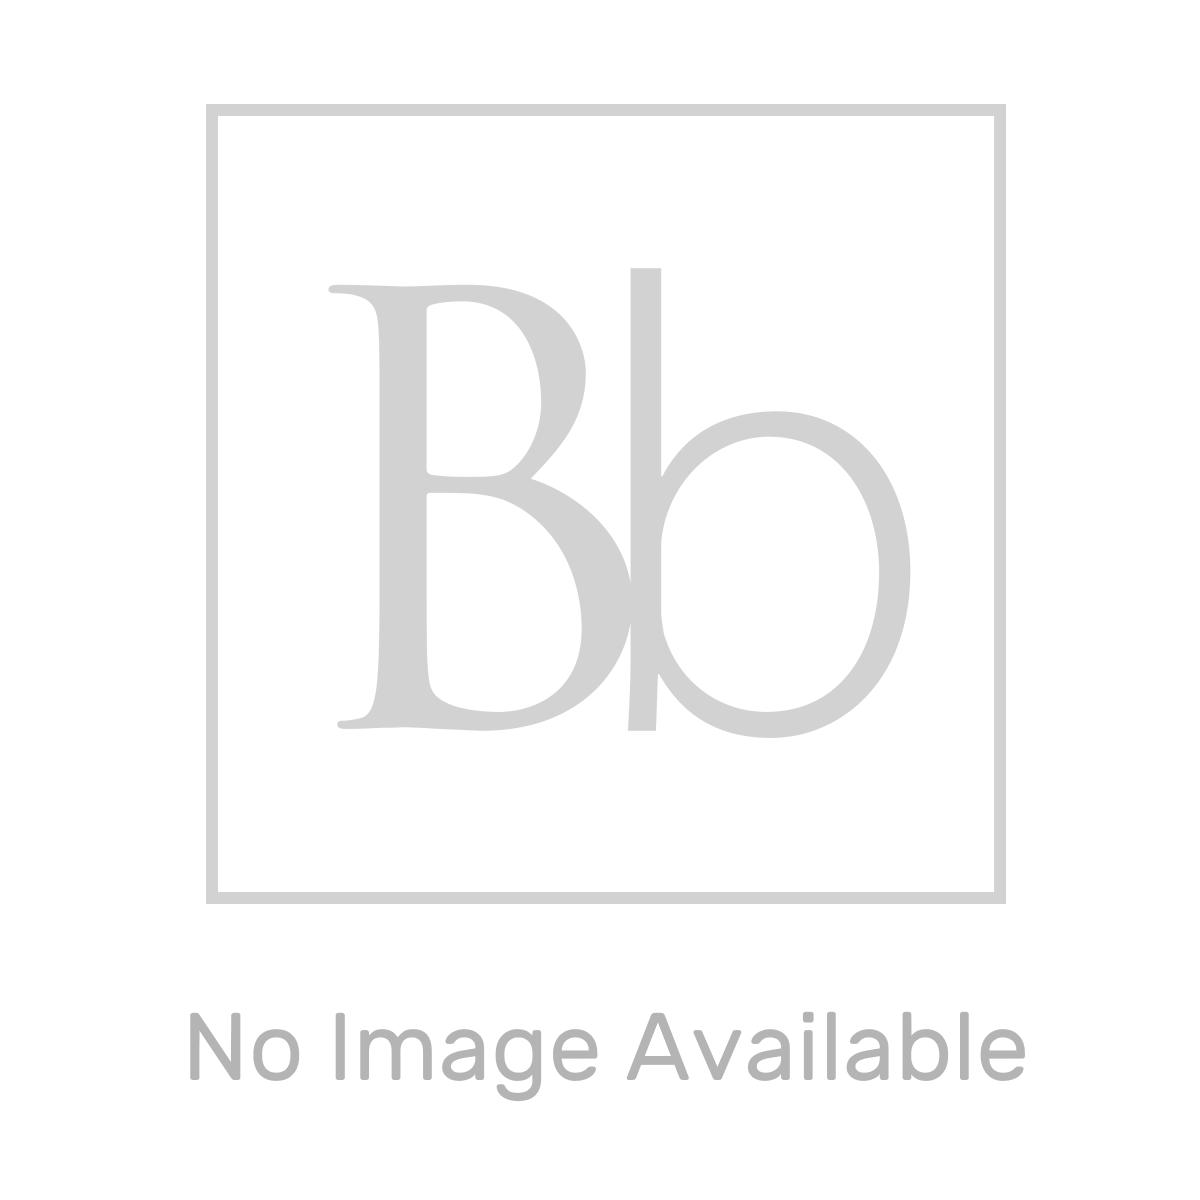 Salamander RP50TU 1.5 Bar Twin Universal Bathroom Pump